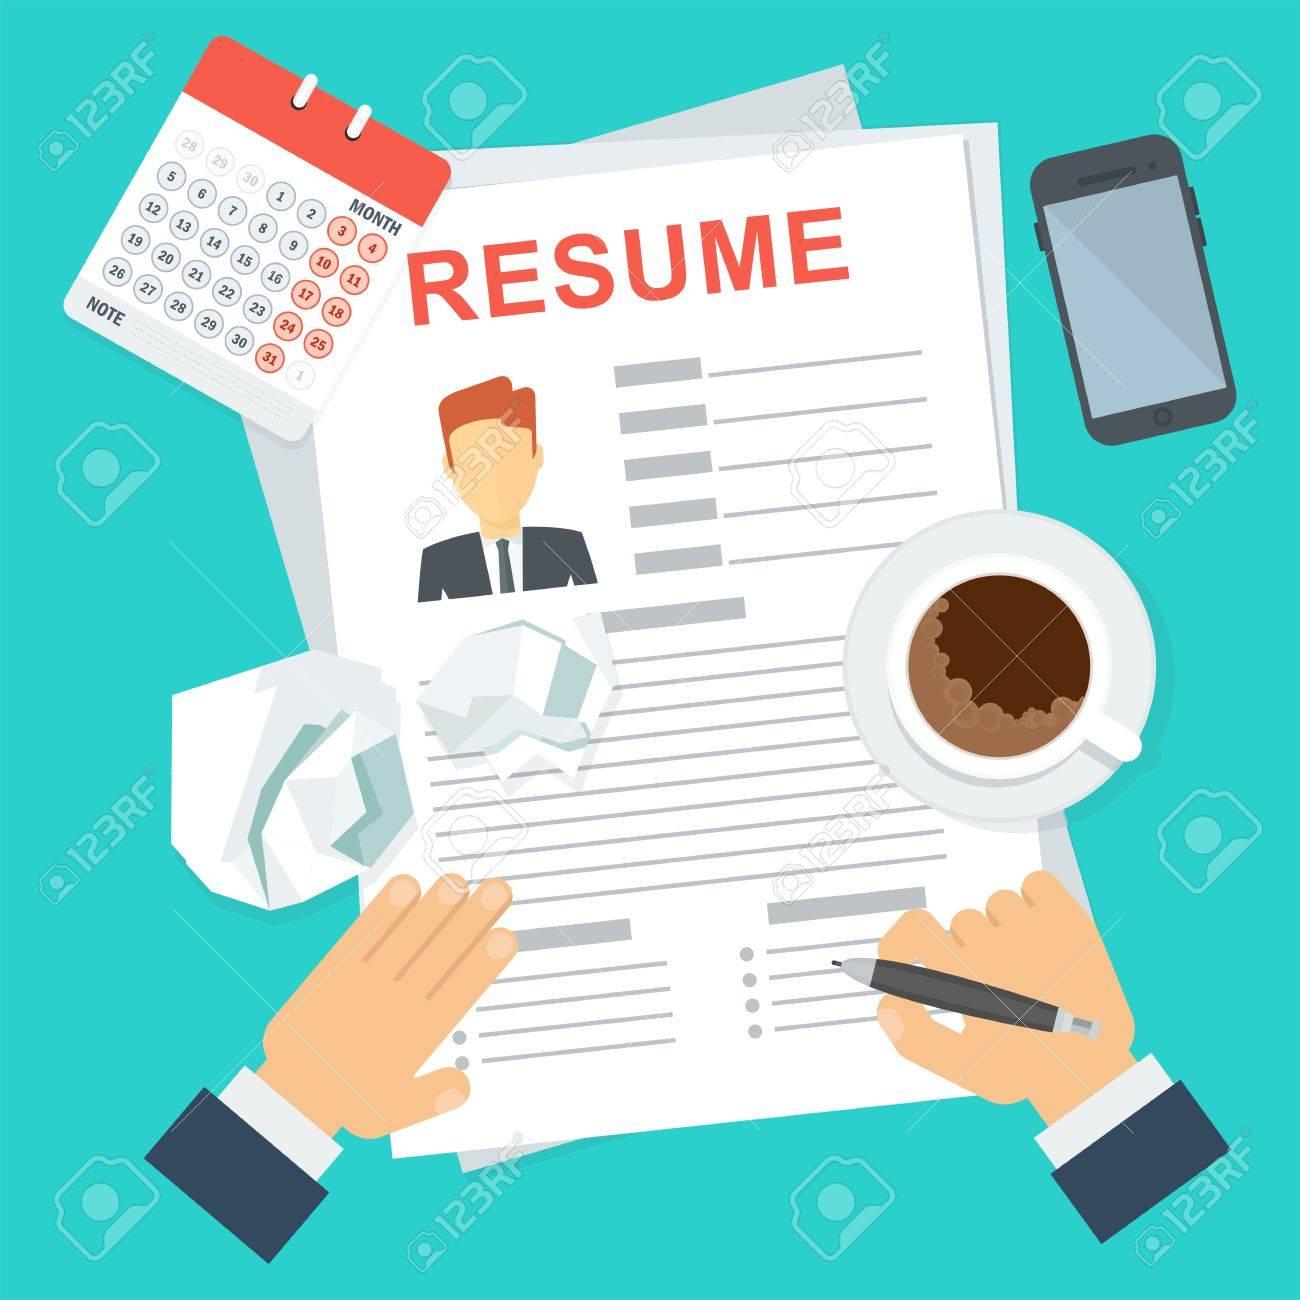 Toronto Executive Resume Service